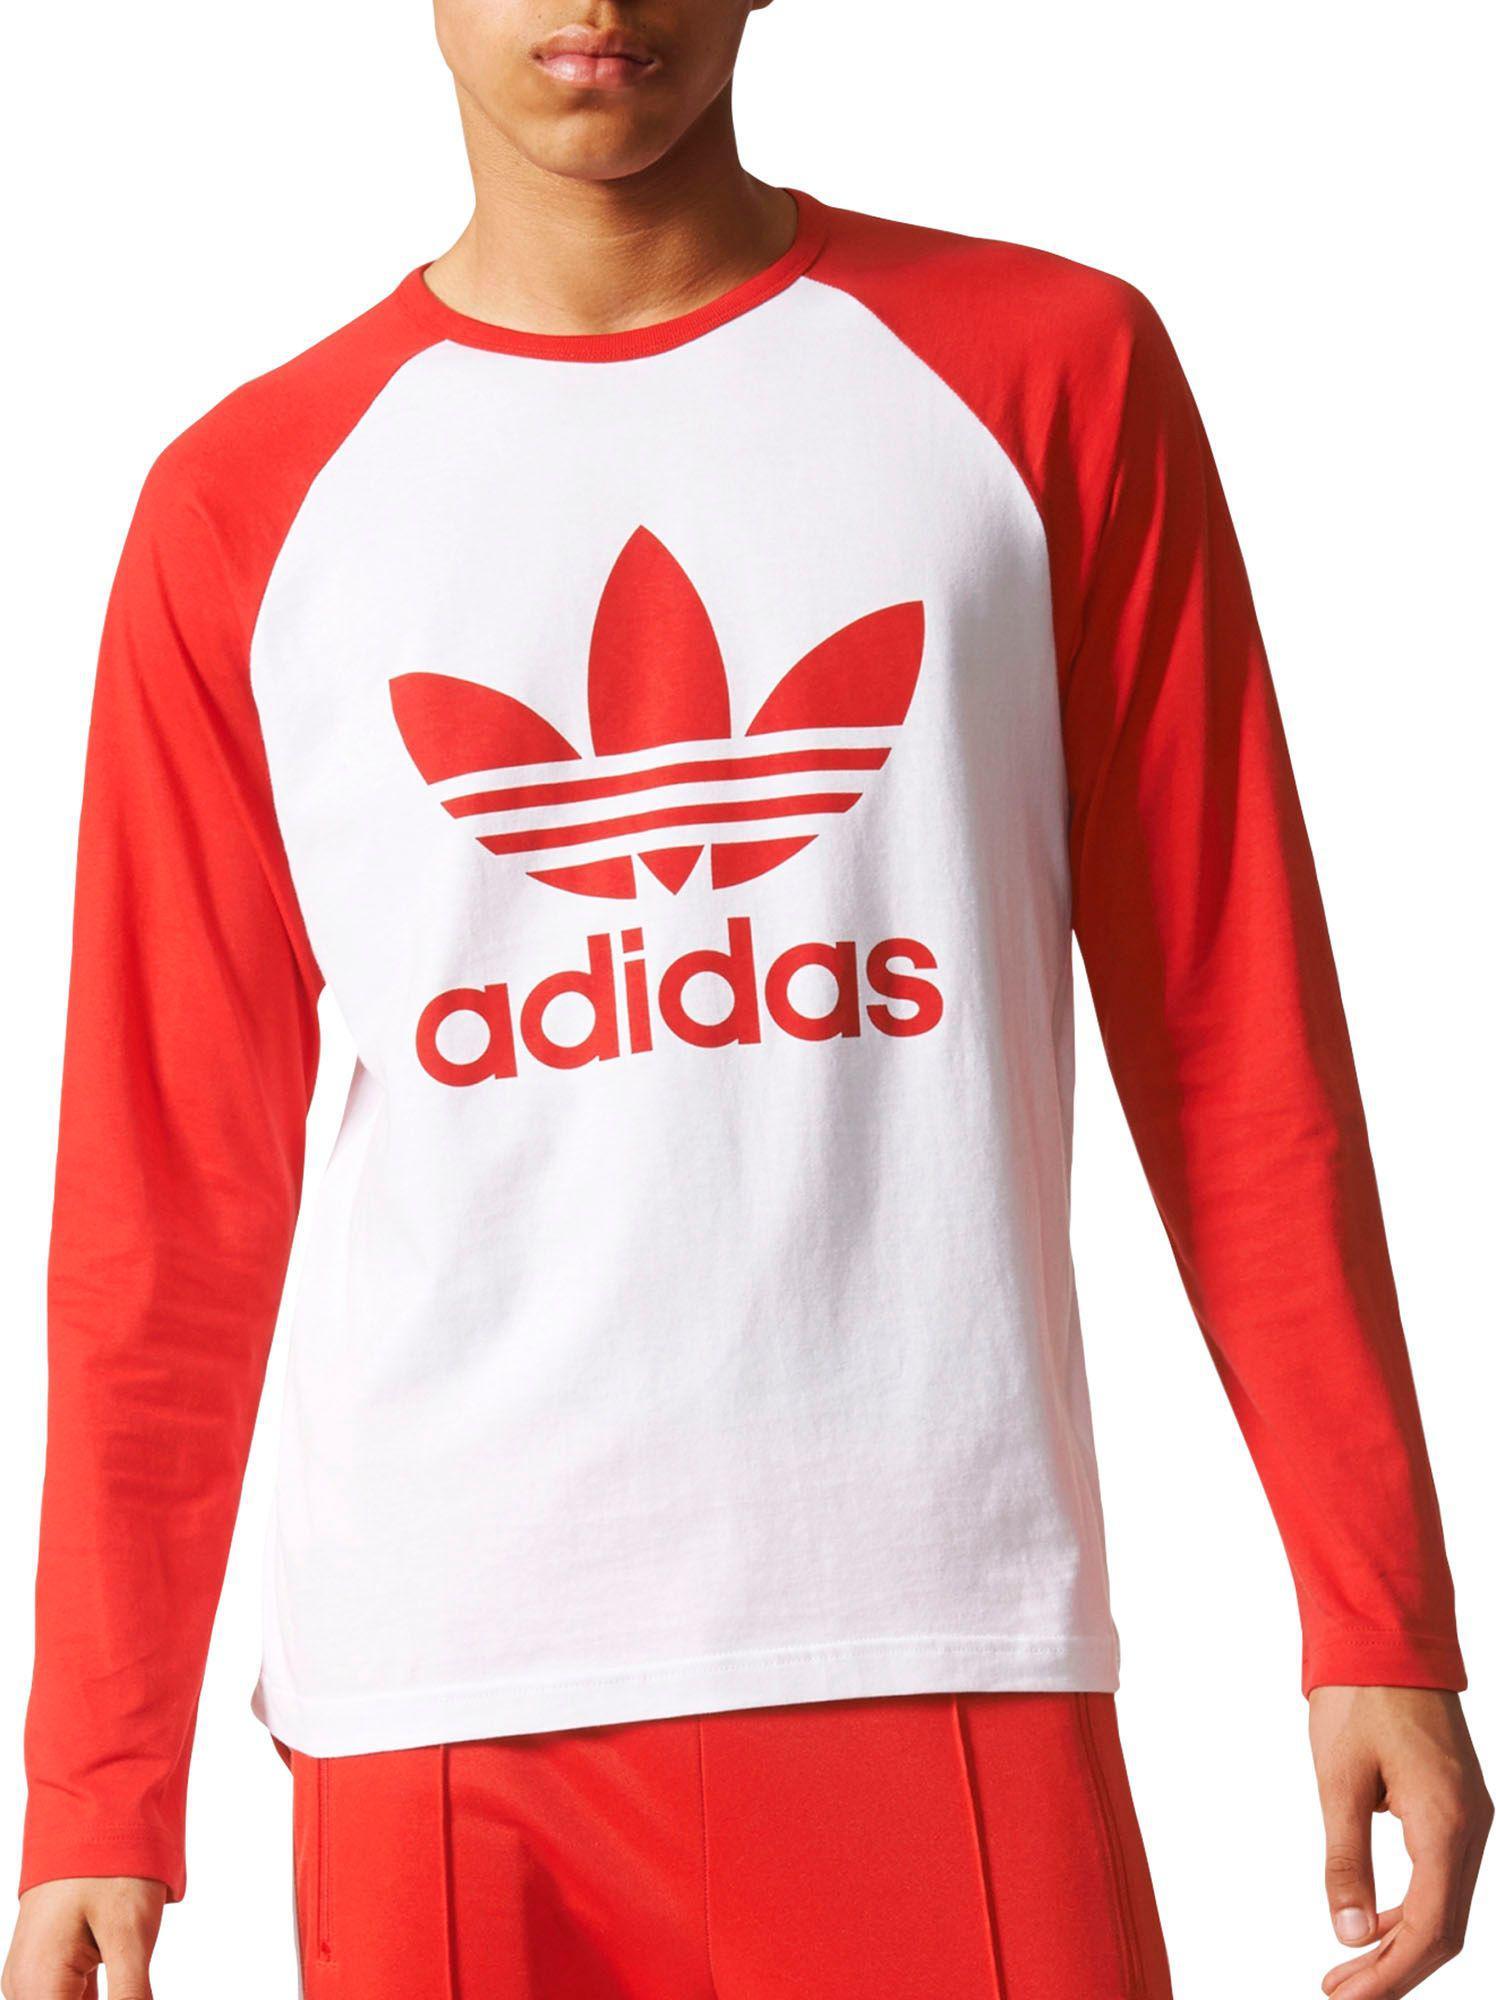 red adidas long sleeve shirt